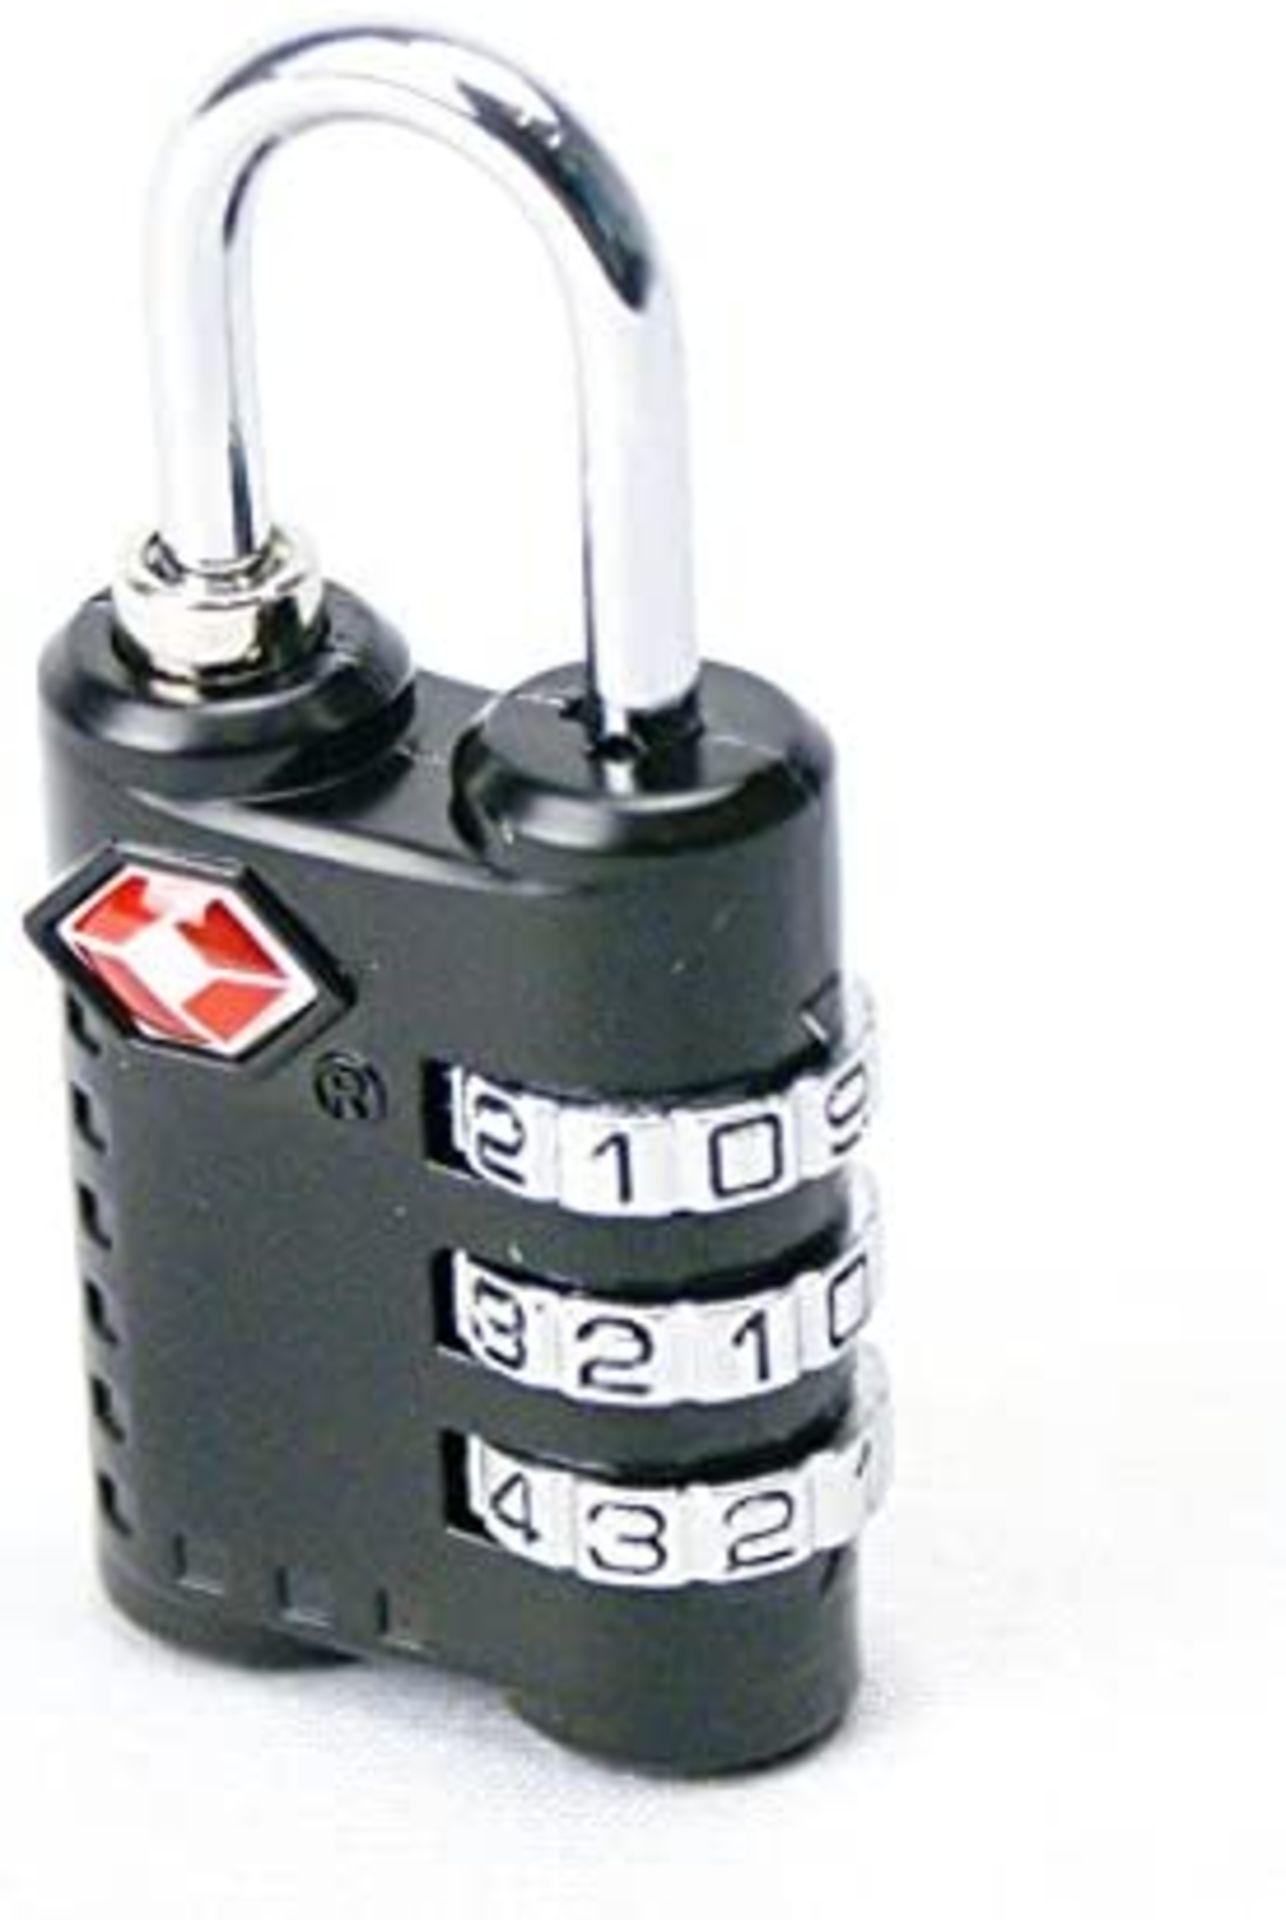 Brand New AA Combination Lock - Image 2 of 2